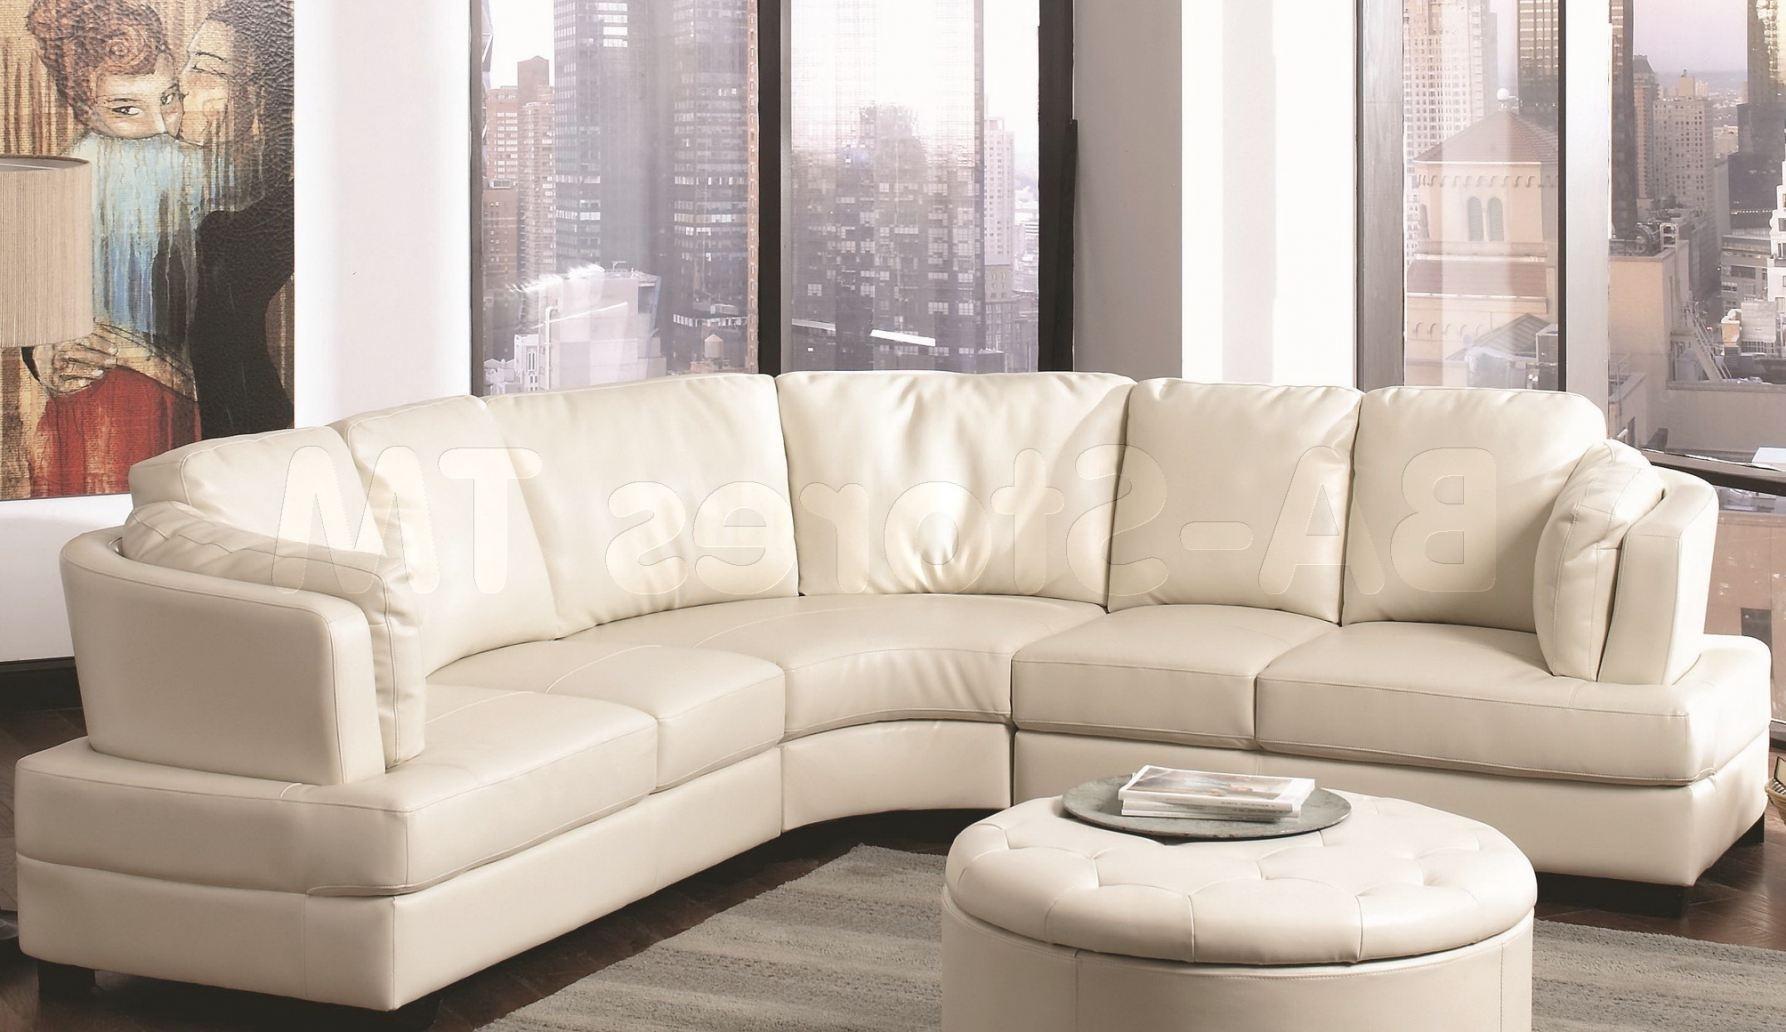 Leather Sectional Sofa Rochester Ny | Catosfera Inside Rochester Ny Sectional Sofas (View 7 of 10)